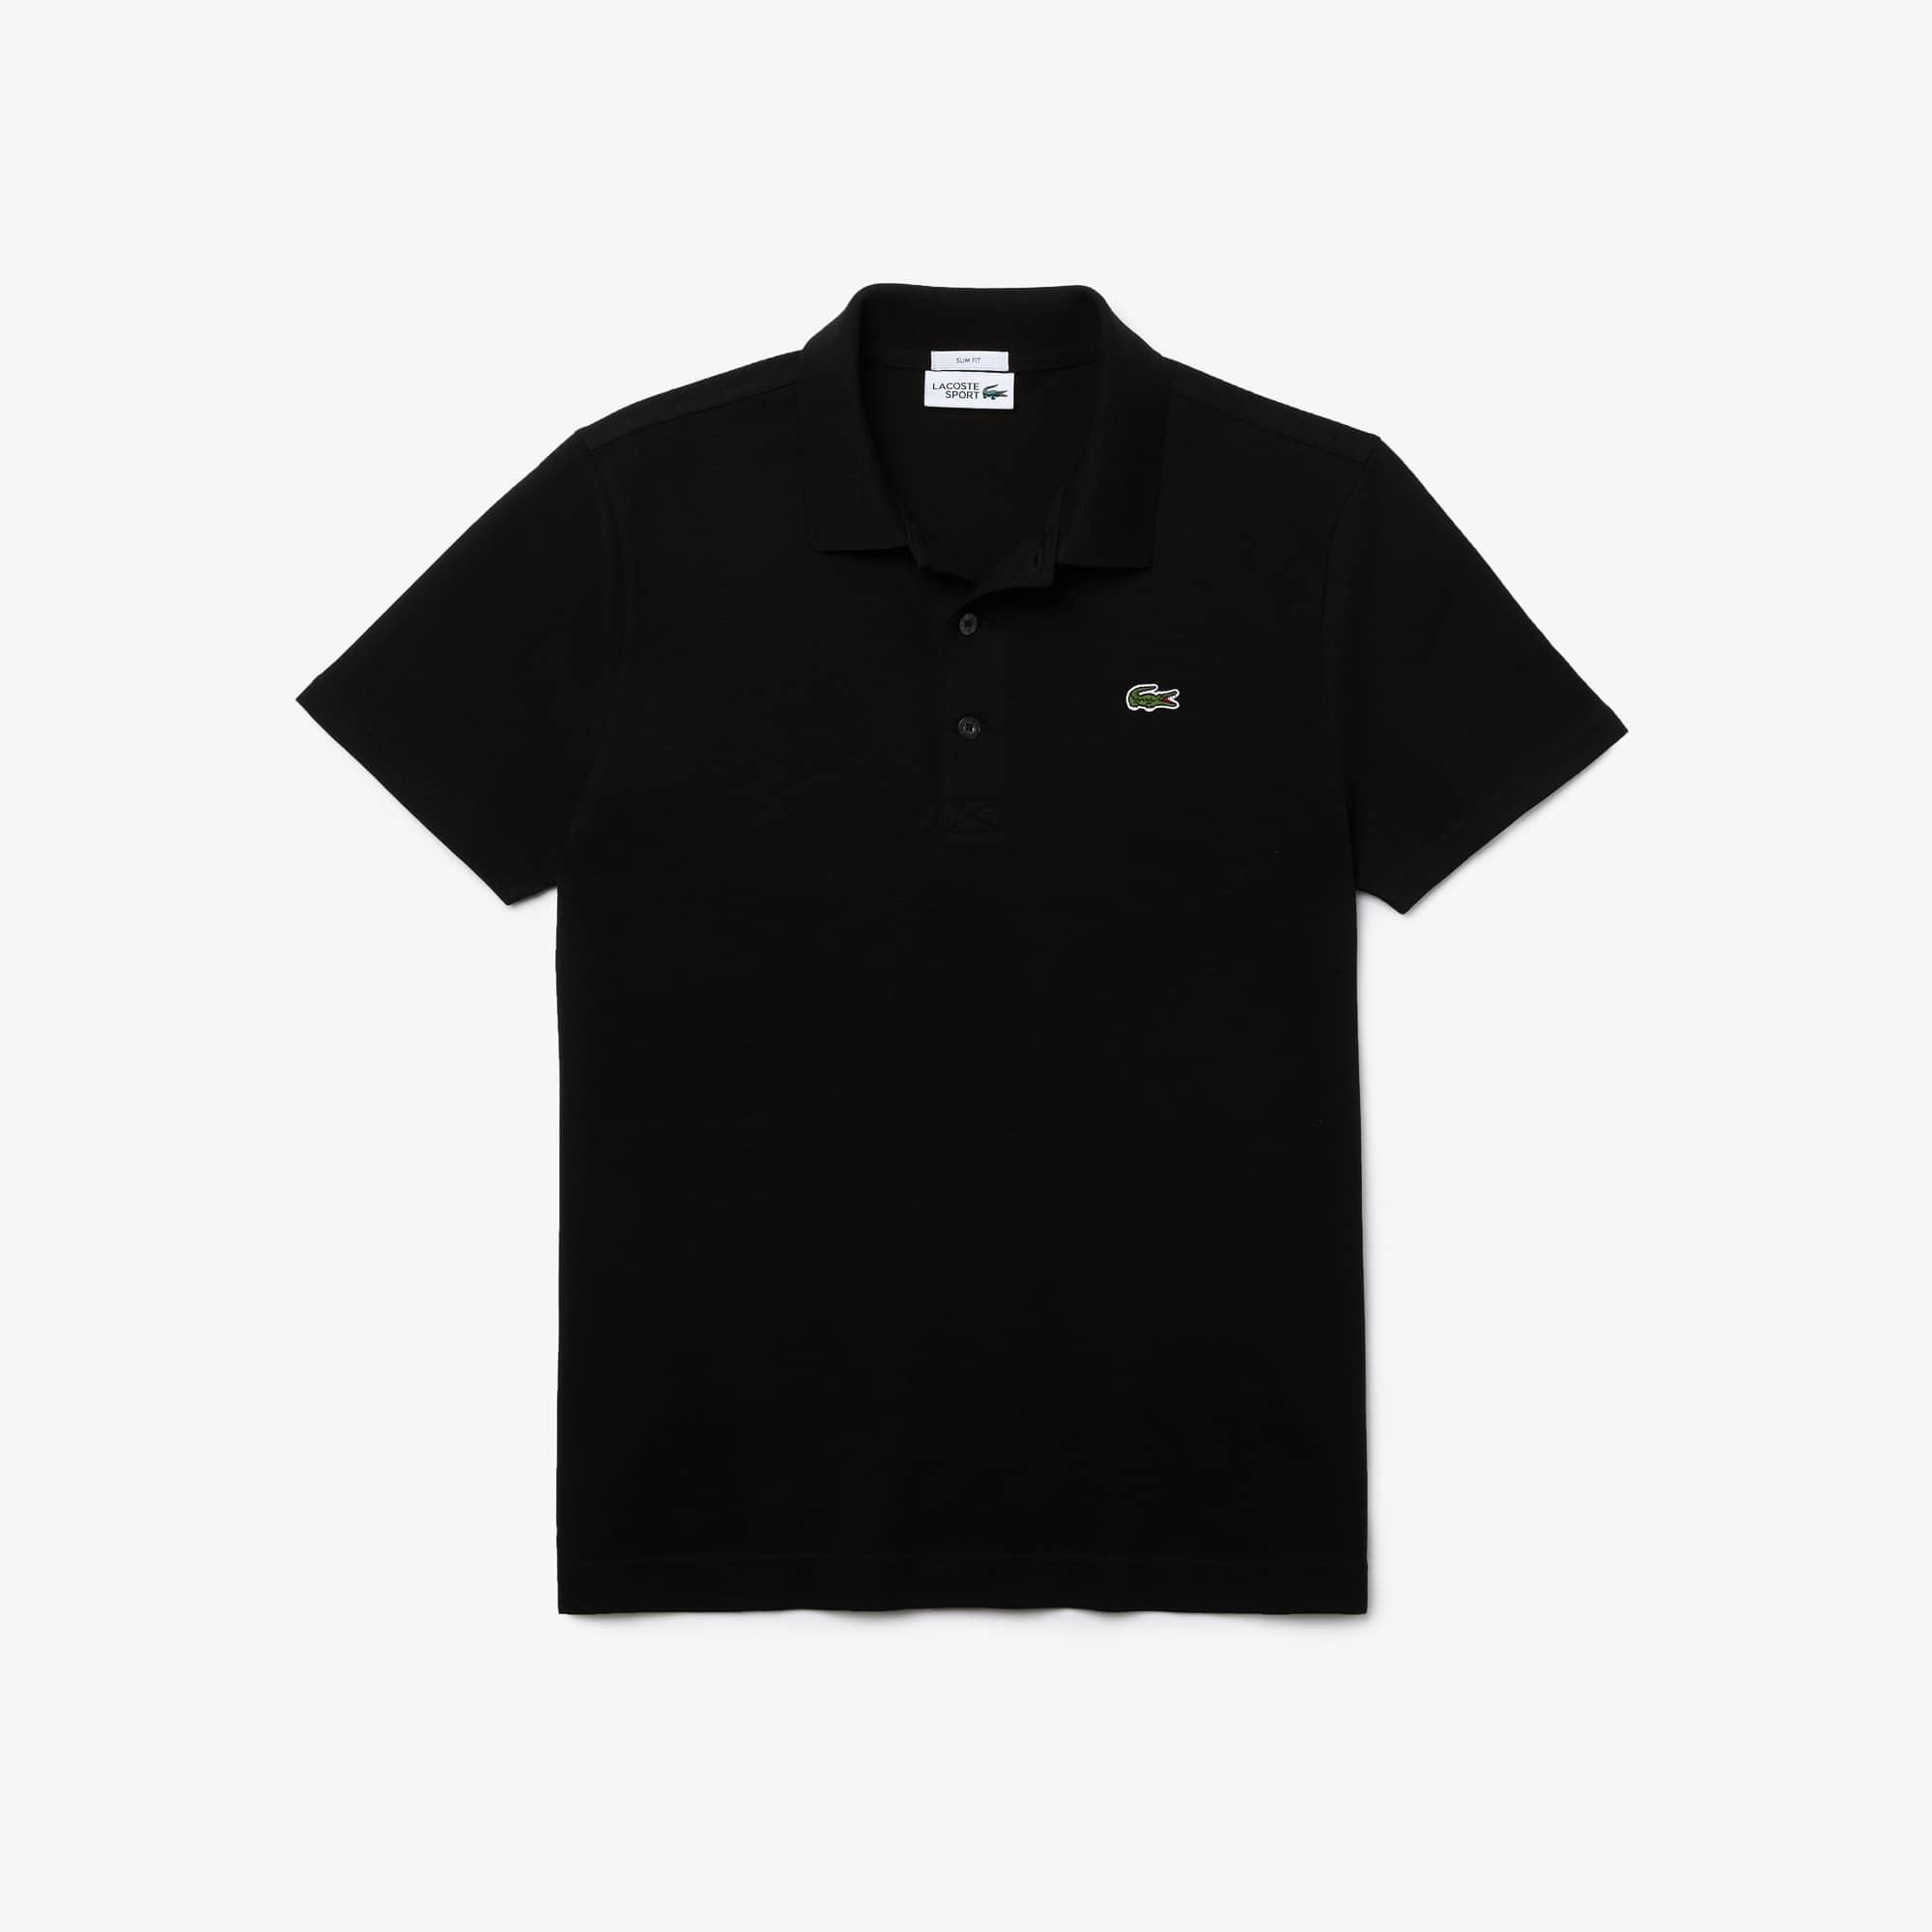 c7471bd7f21f0 Men s Lacoste SPORT Tennis Ultra-Light Cotton Knit Polo Shirt